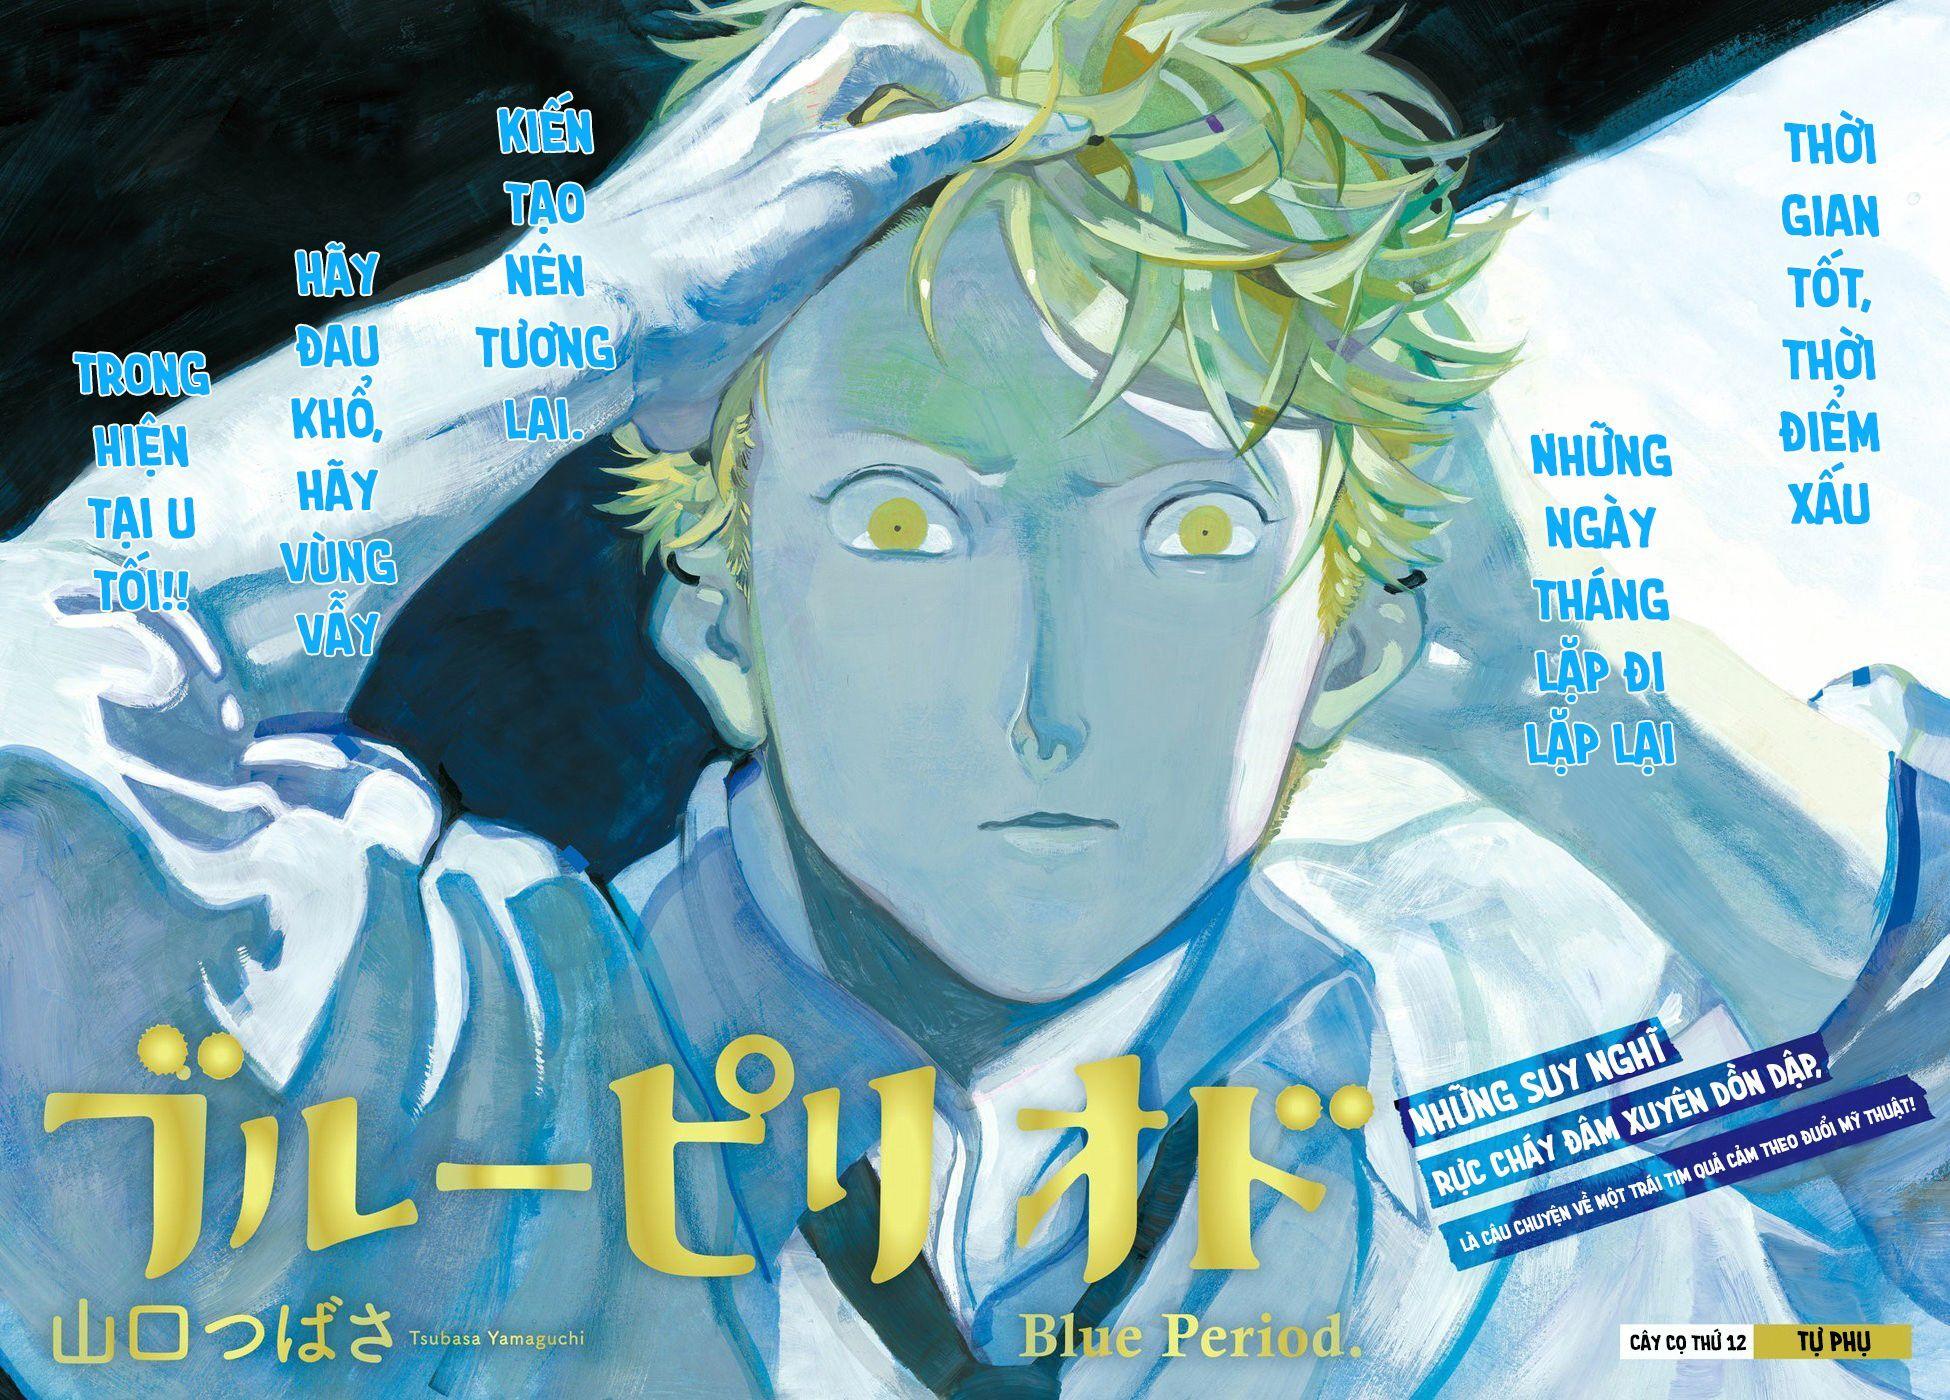 Il manga The Blue Period. vince i Manga Taisho Awards